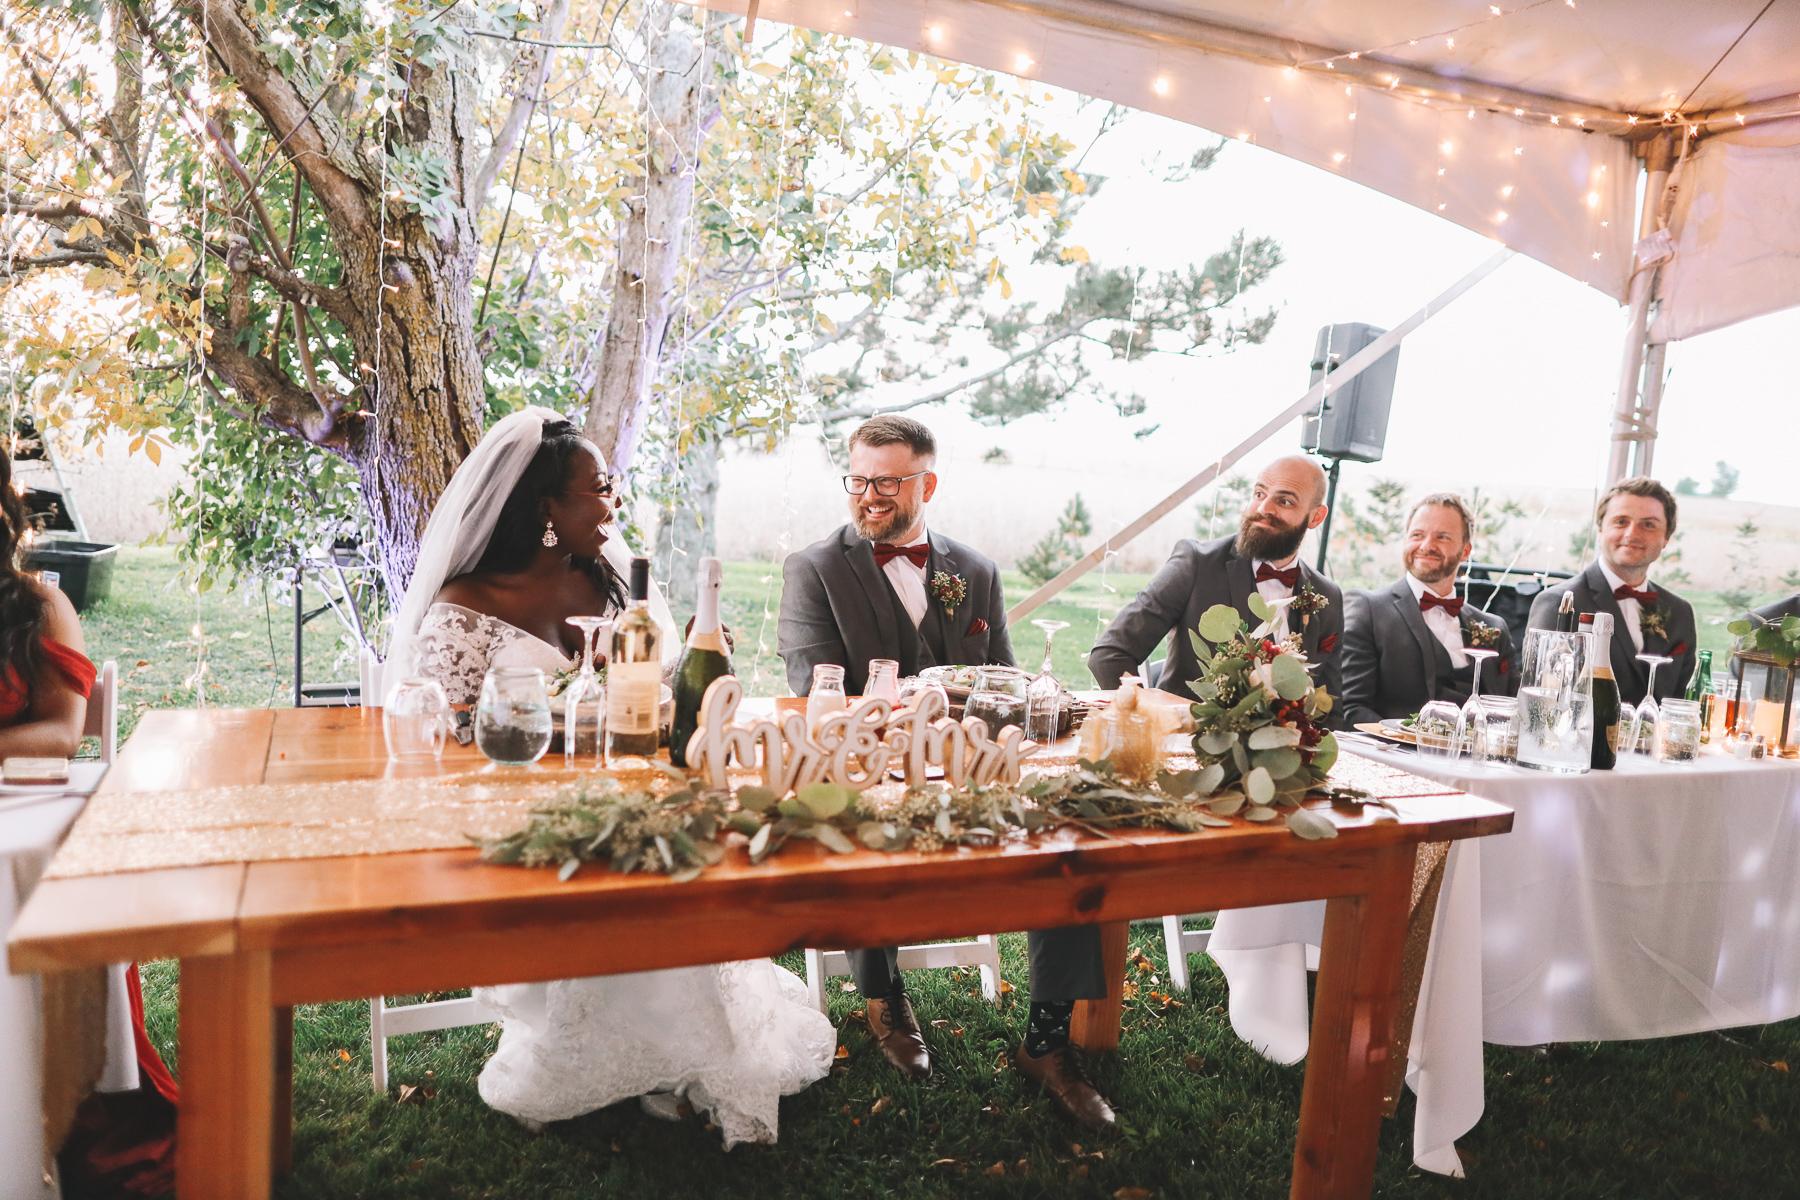 outdoor wedding reception ideas | Charlie and Shirleys Wedding